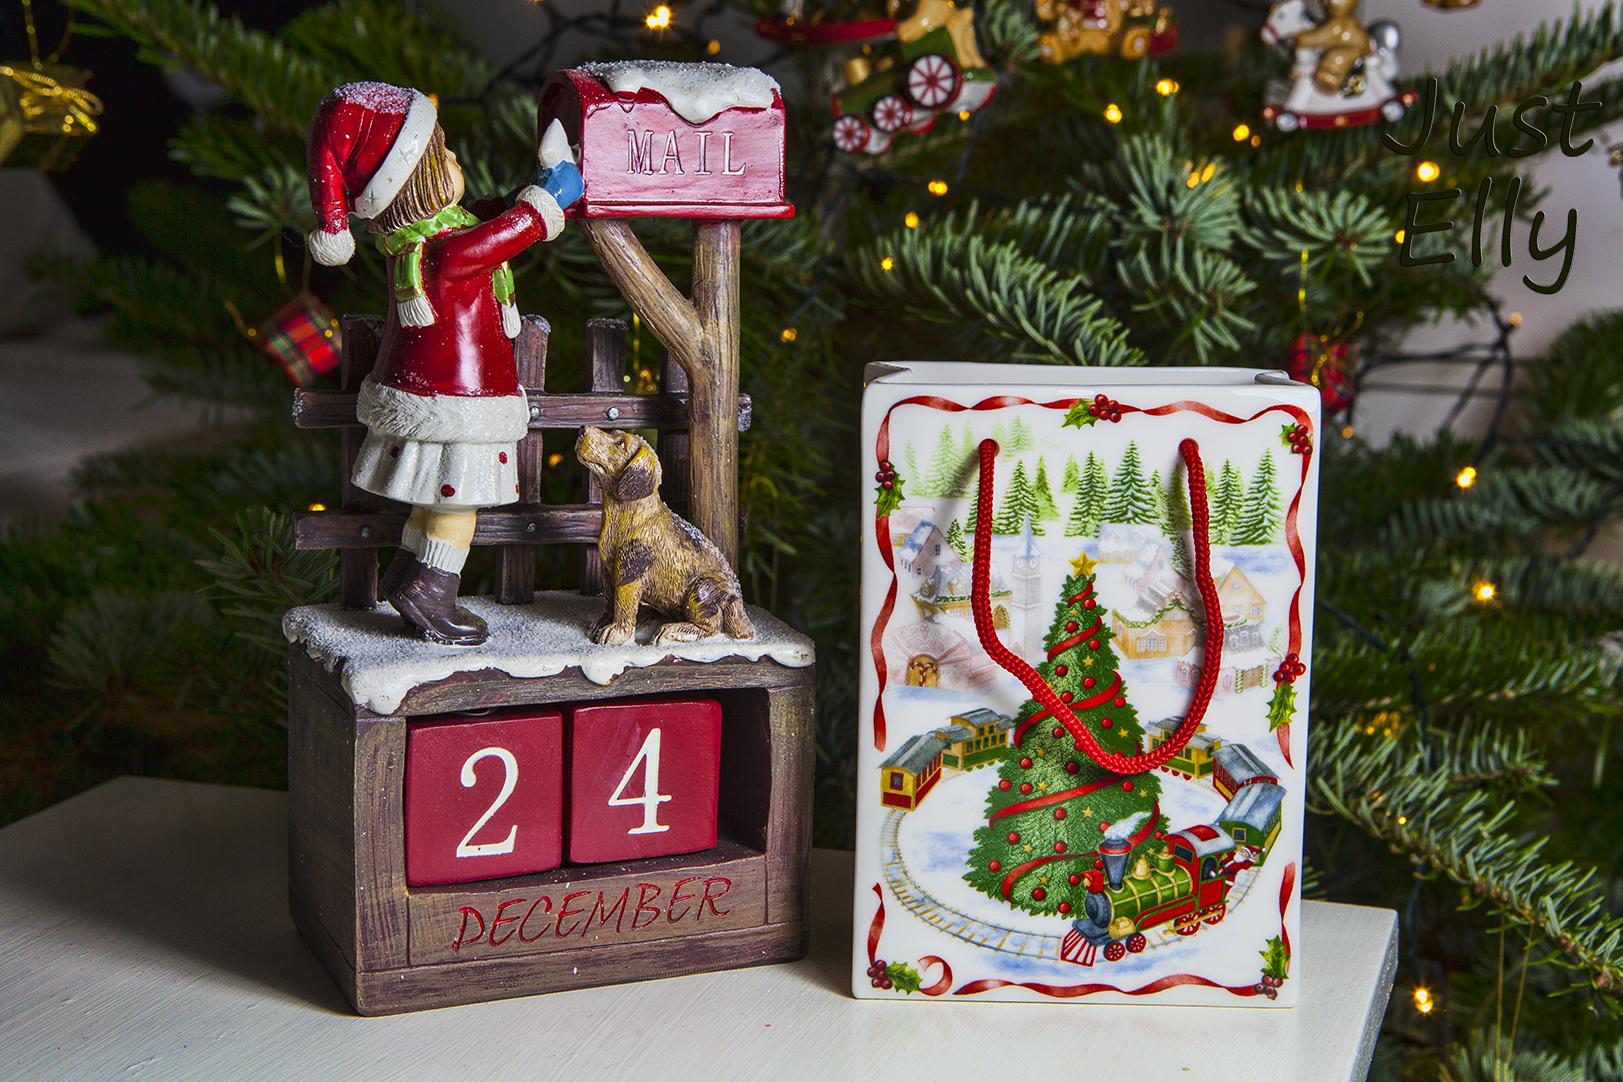 December 24th - My advent calendar